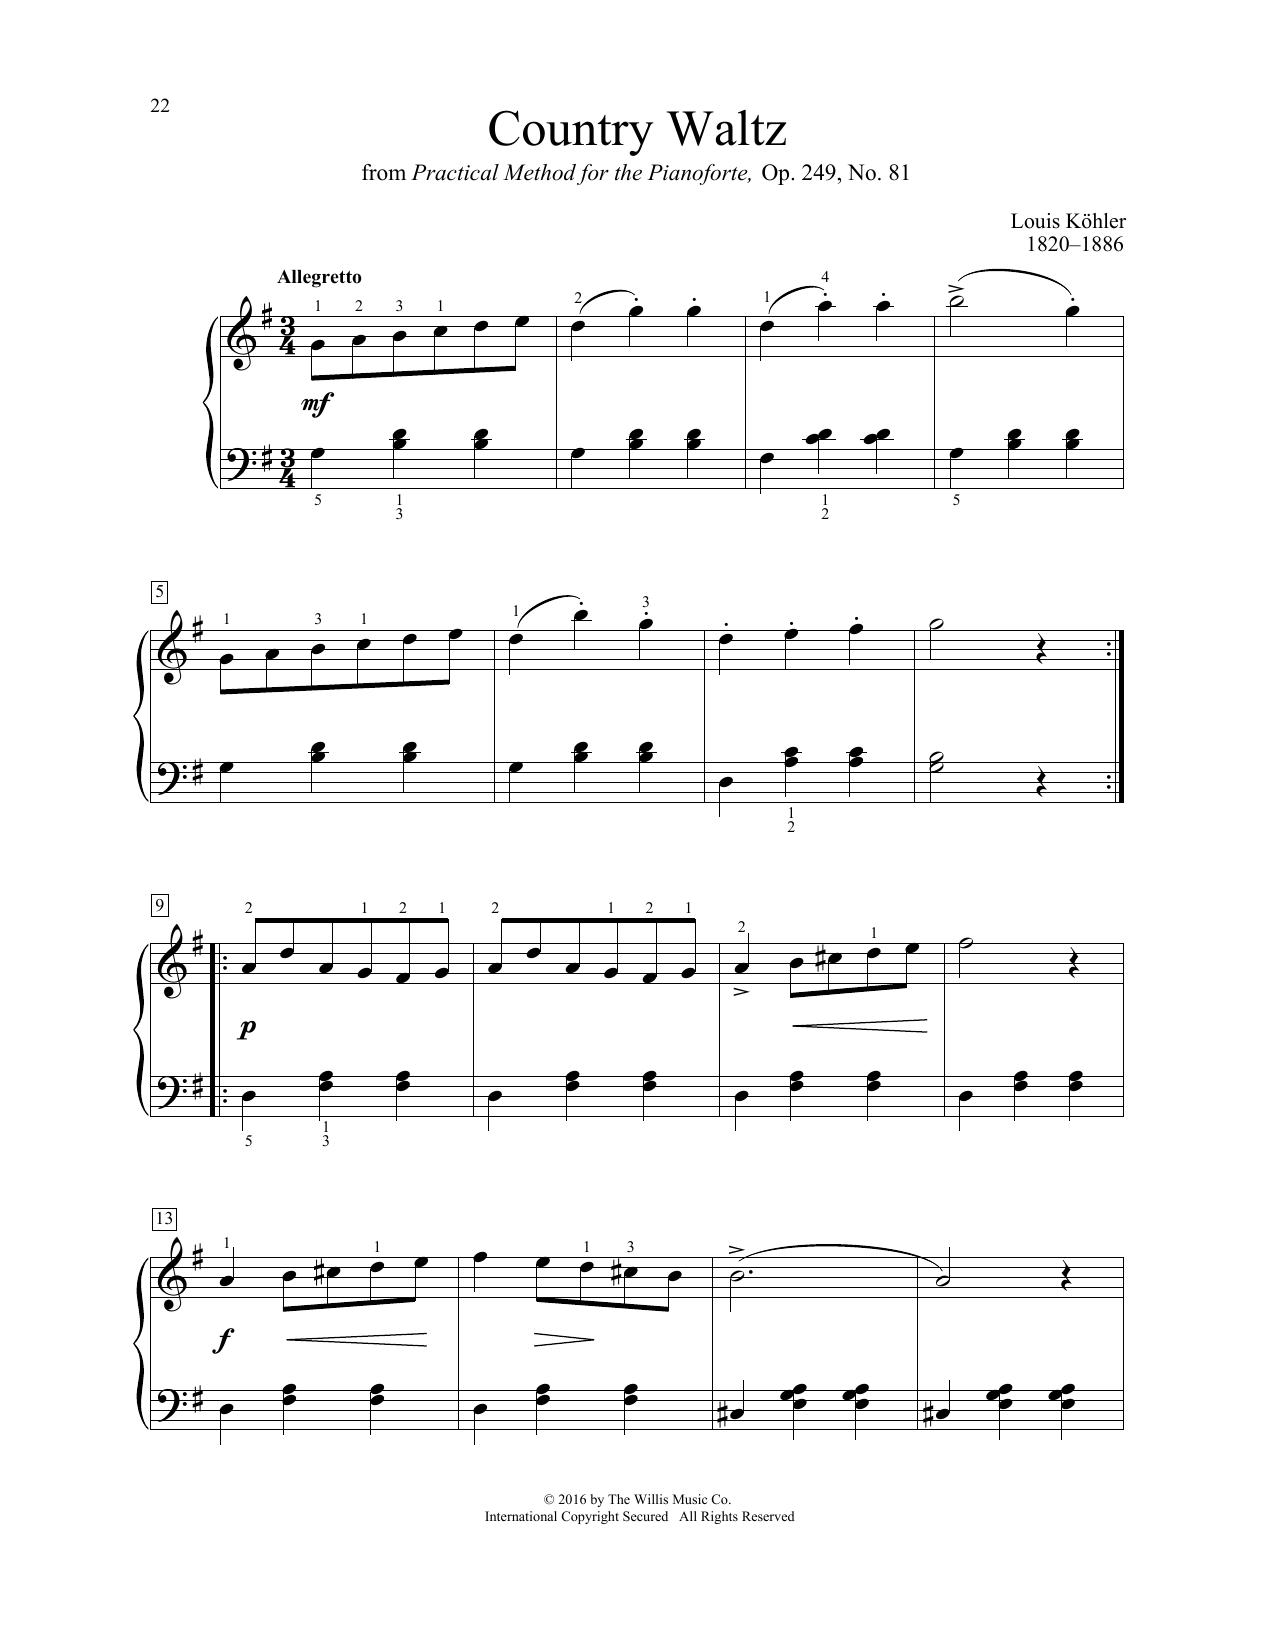 Louis Kohler Country Waltz sheet music notes and chords. Download Printable PDF.